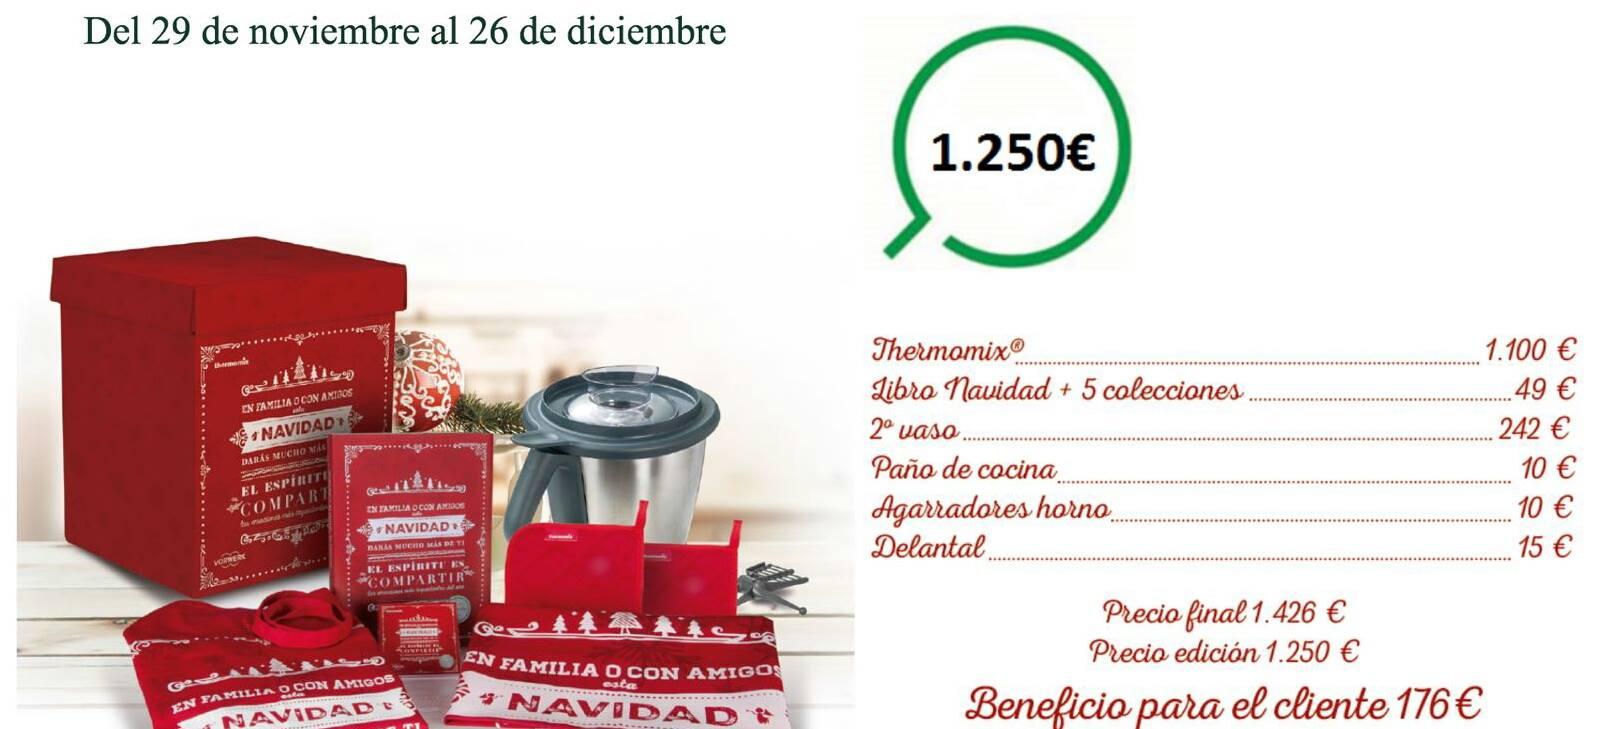 Thermomix® Edición Navidad ¡un verdadero regalo!